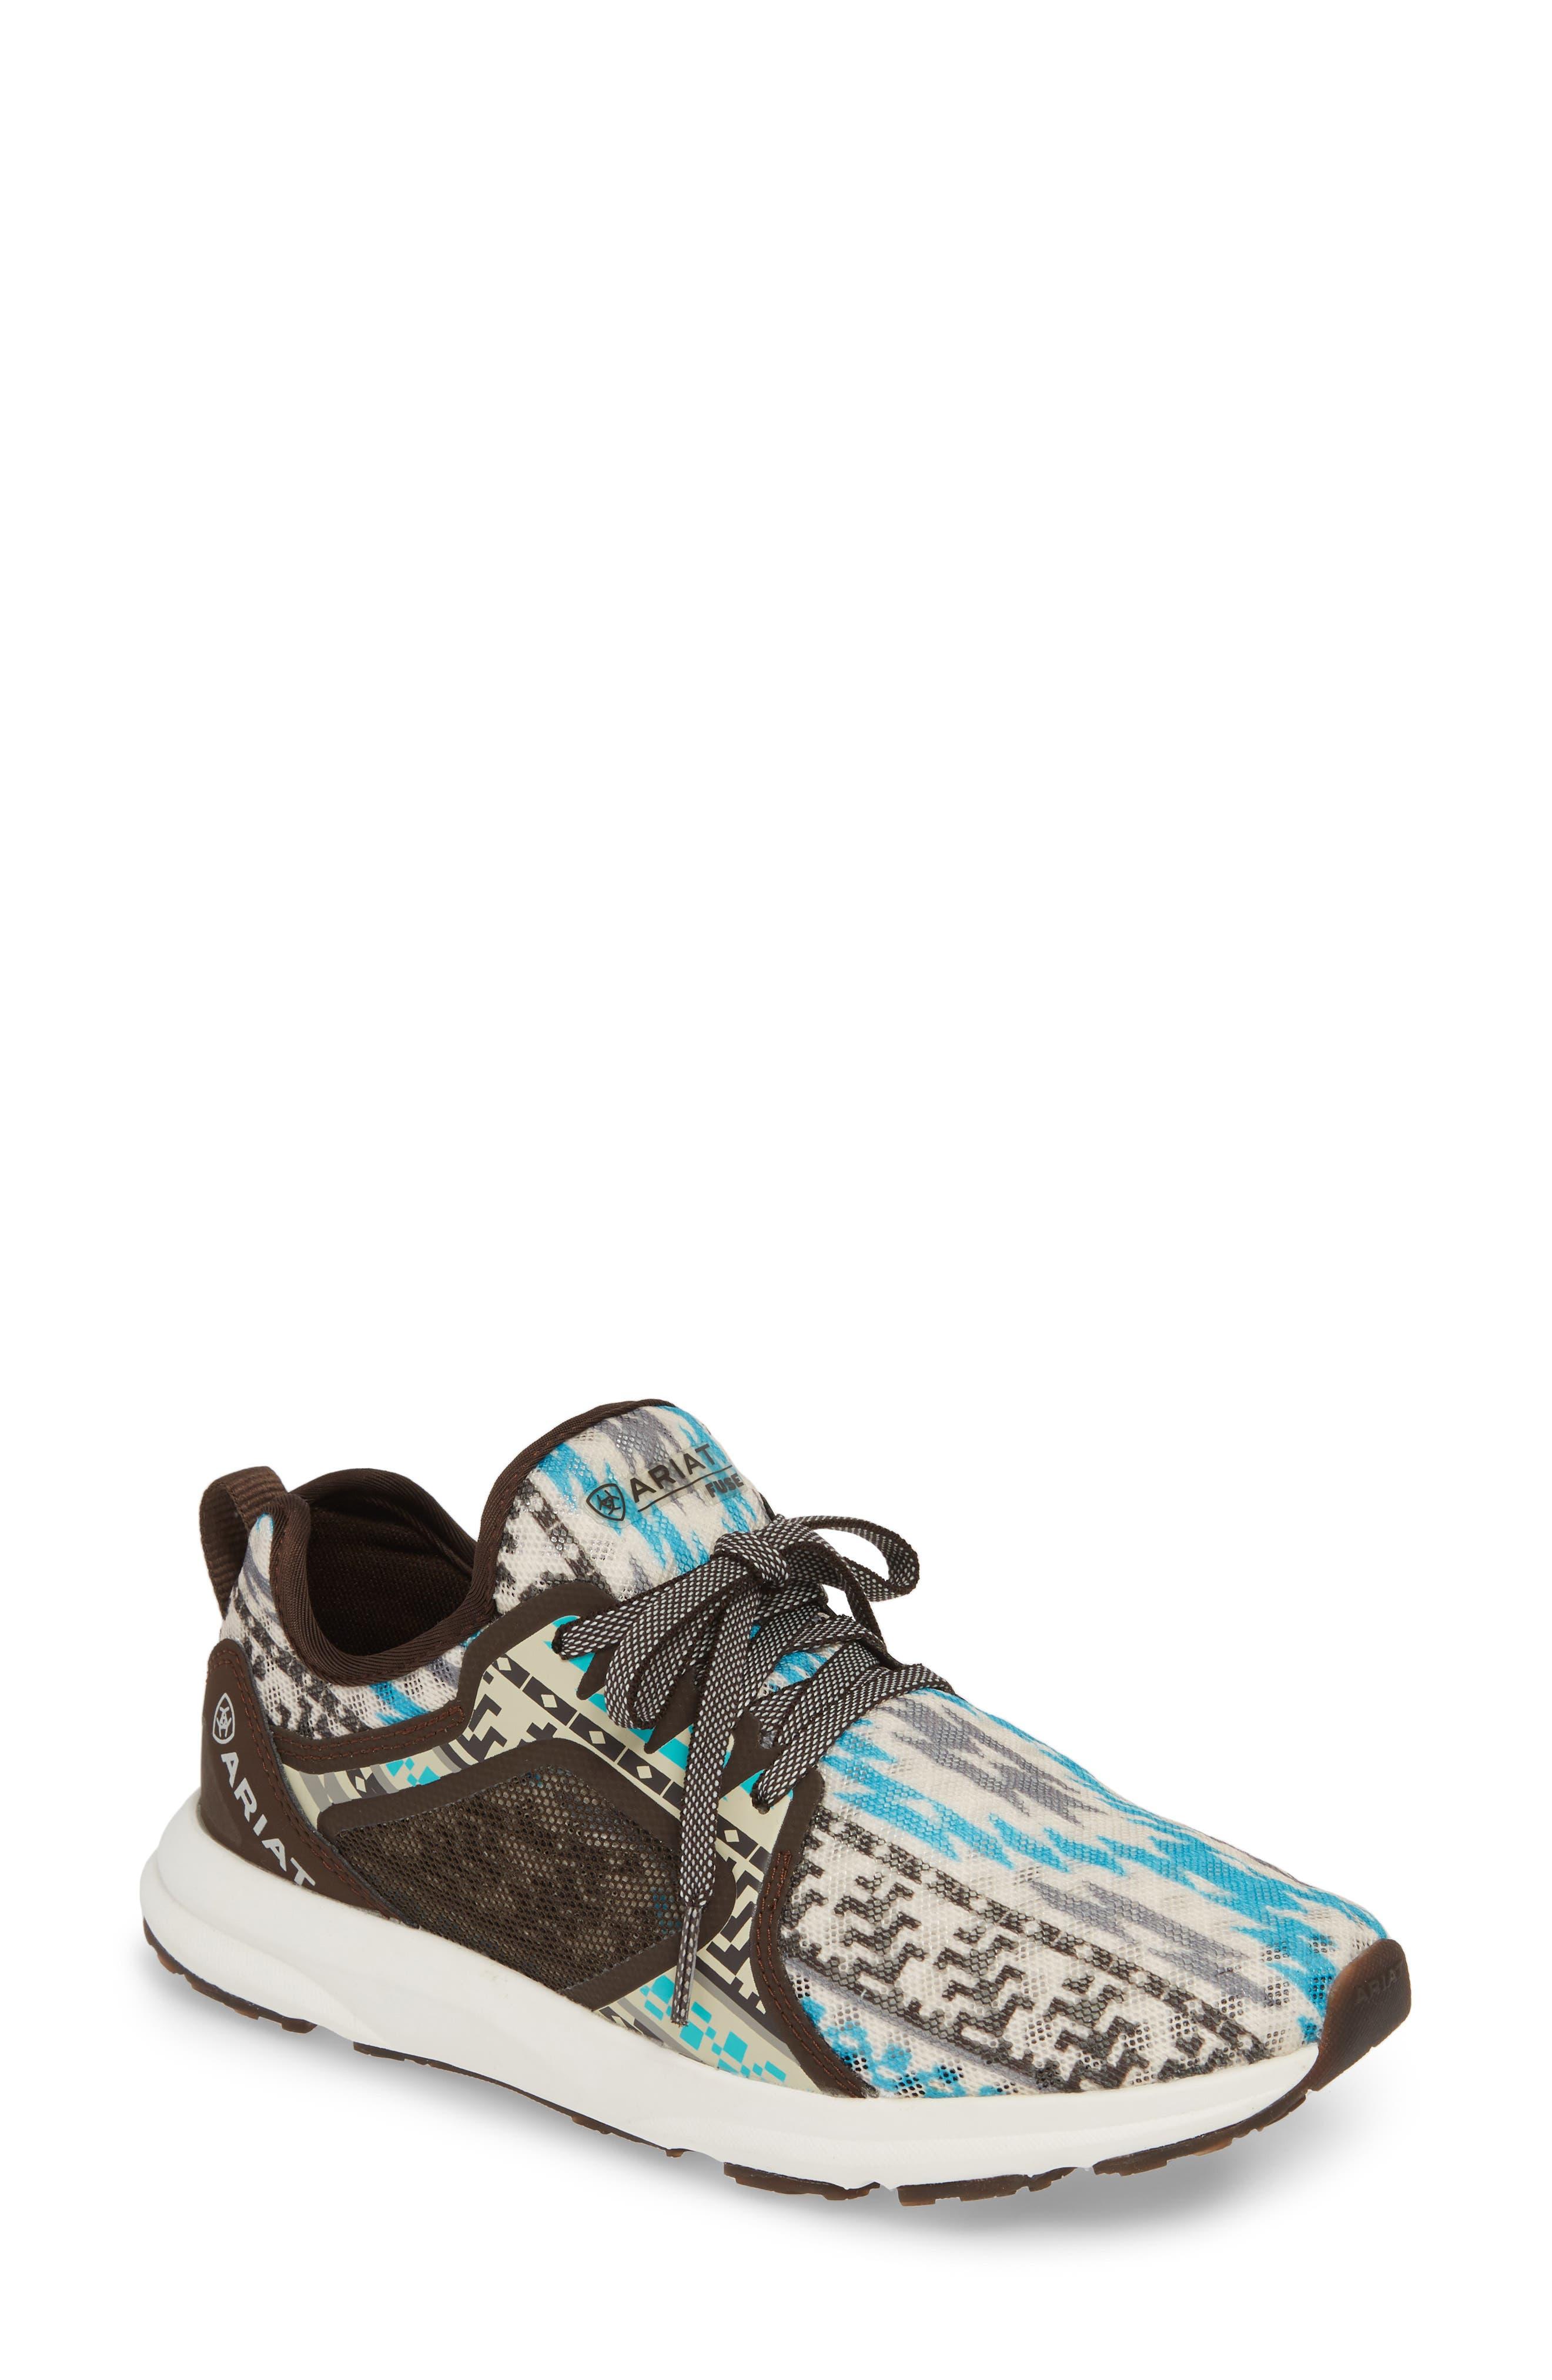 Image of ARIAT Fuse Print Sneaker